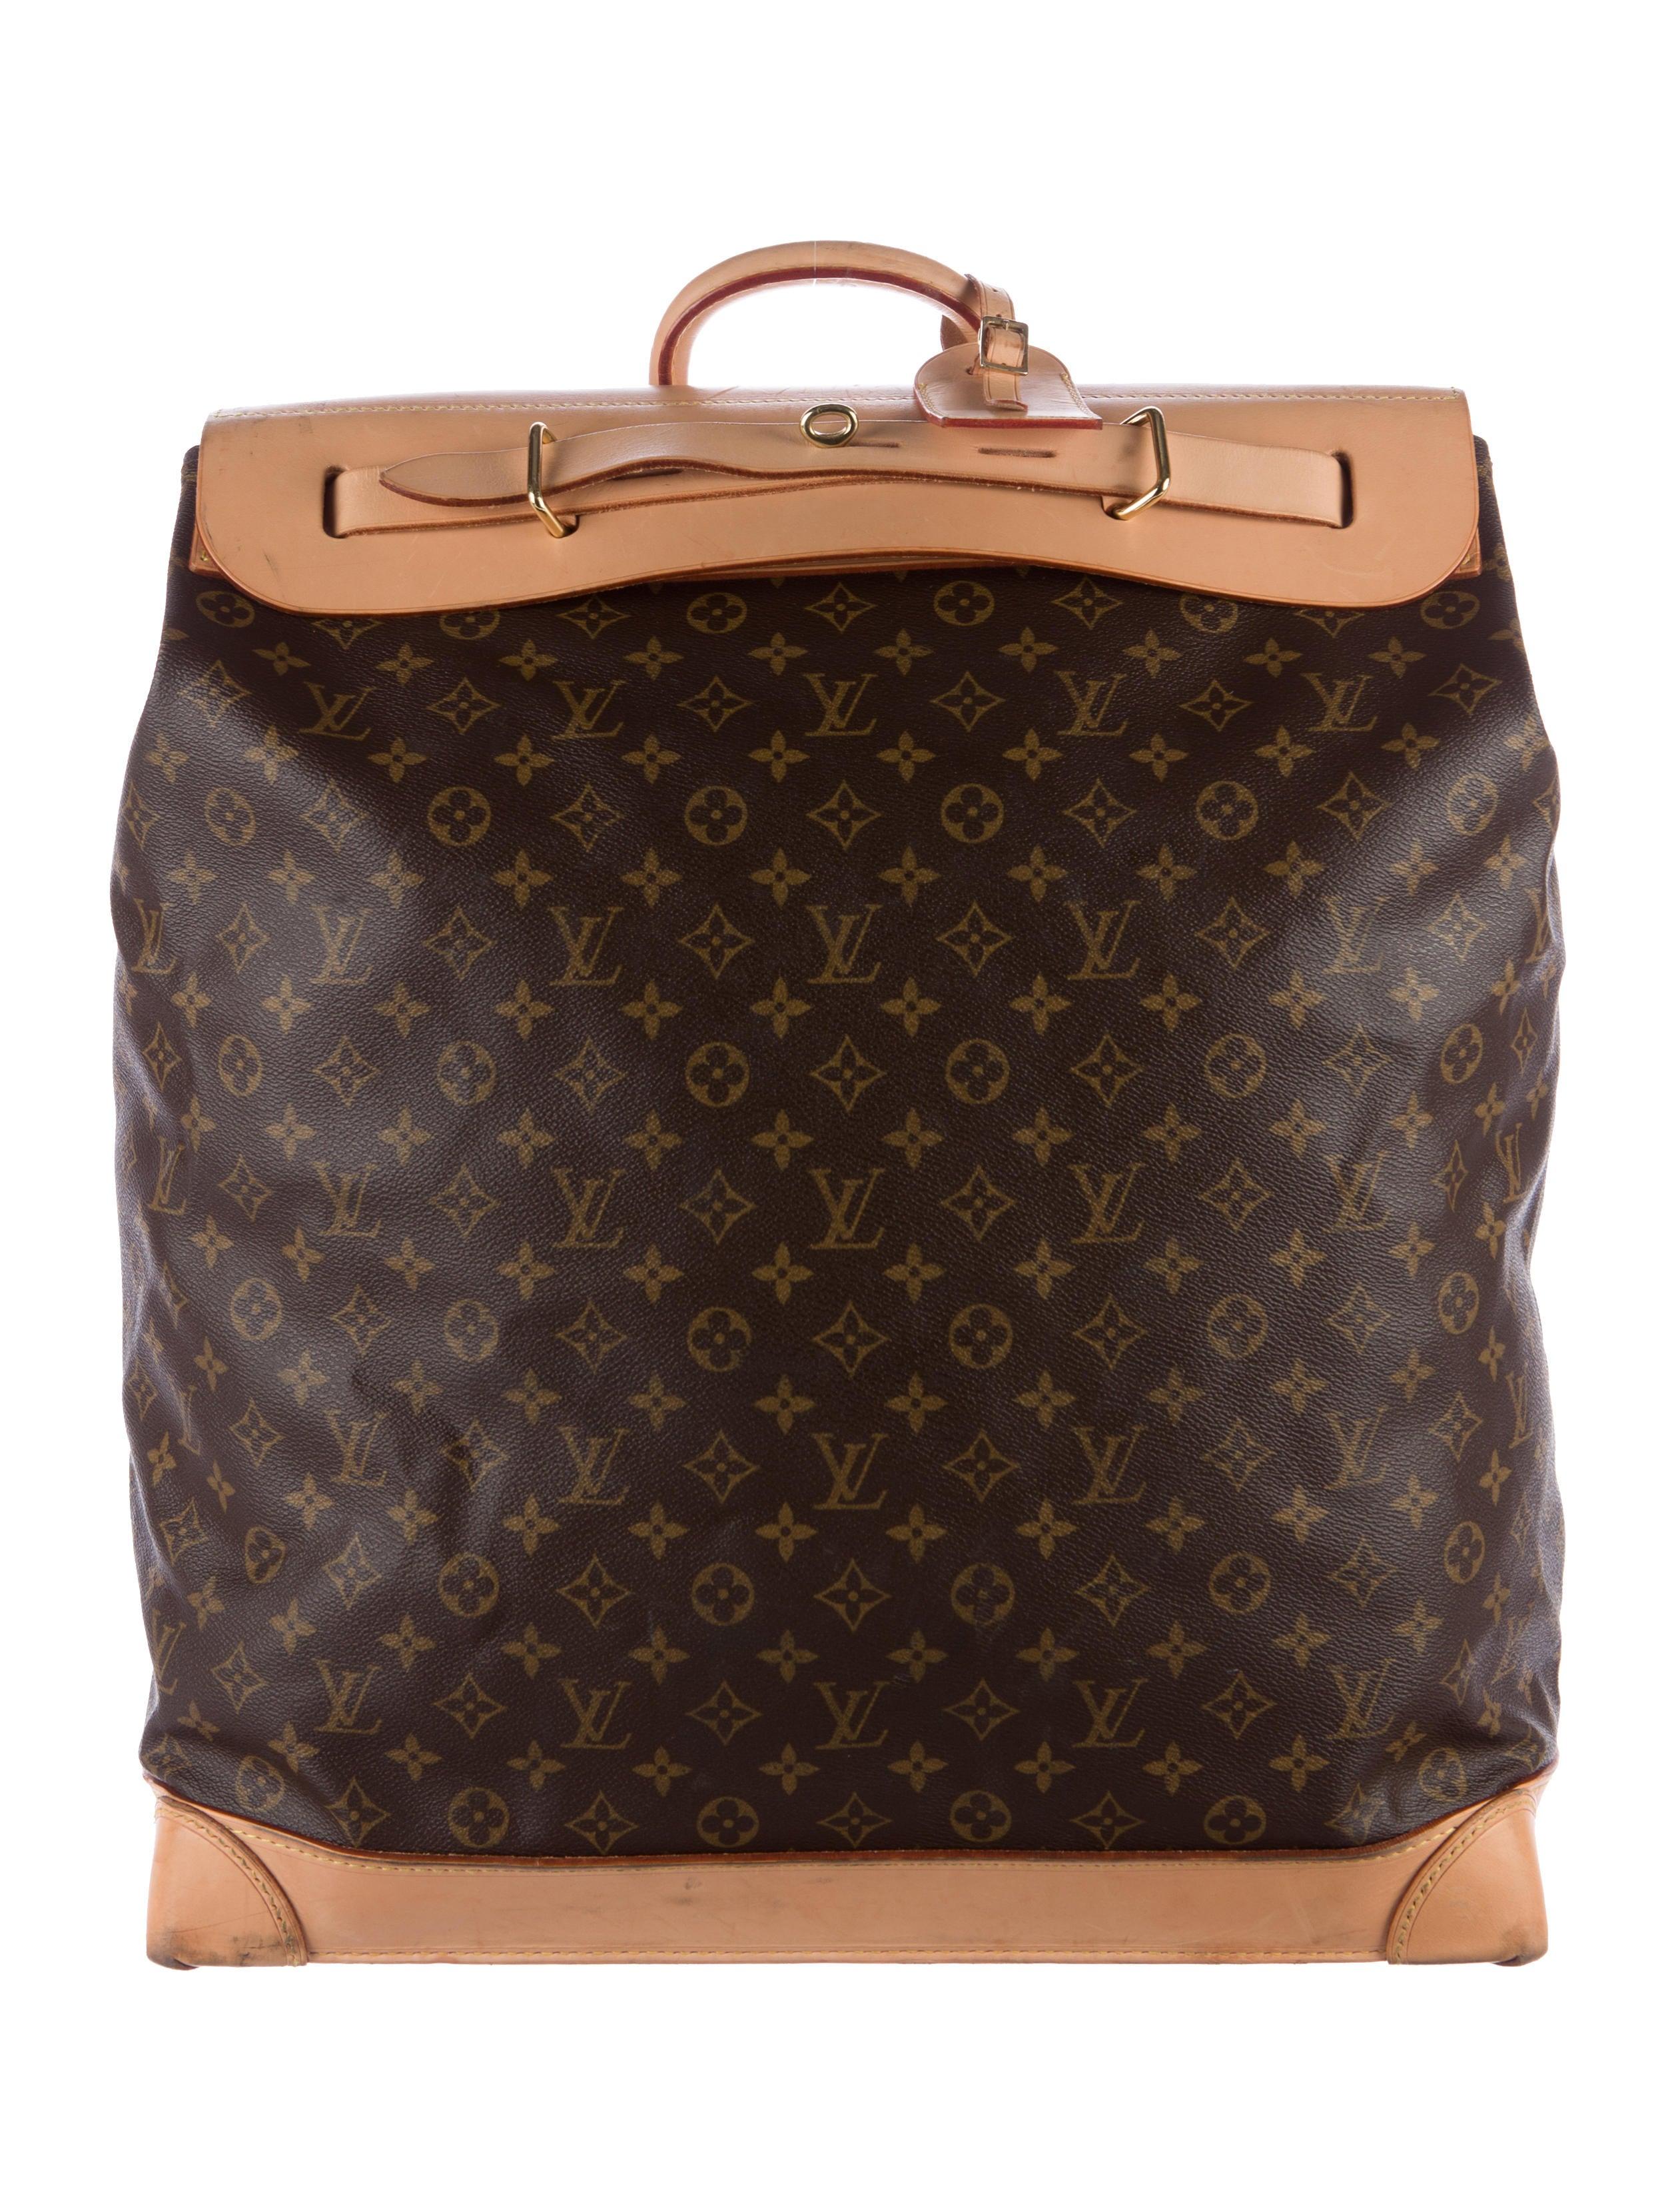 louis vuitton monogram steamer bag 45 handbags lou115828 the realreal. Black Bedroom Furniture Sets. Home Design Ideas